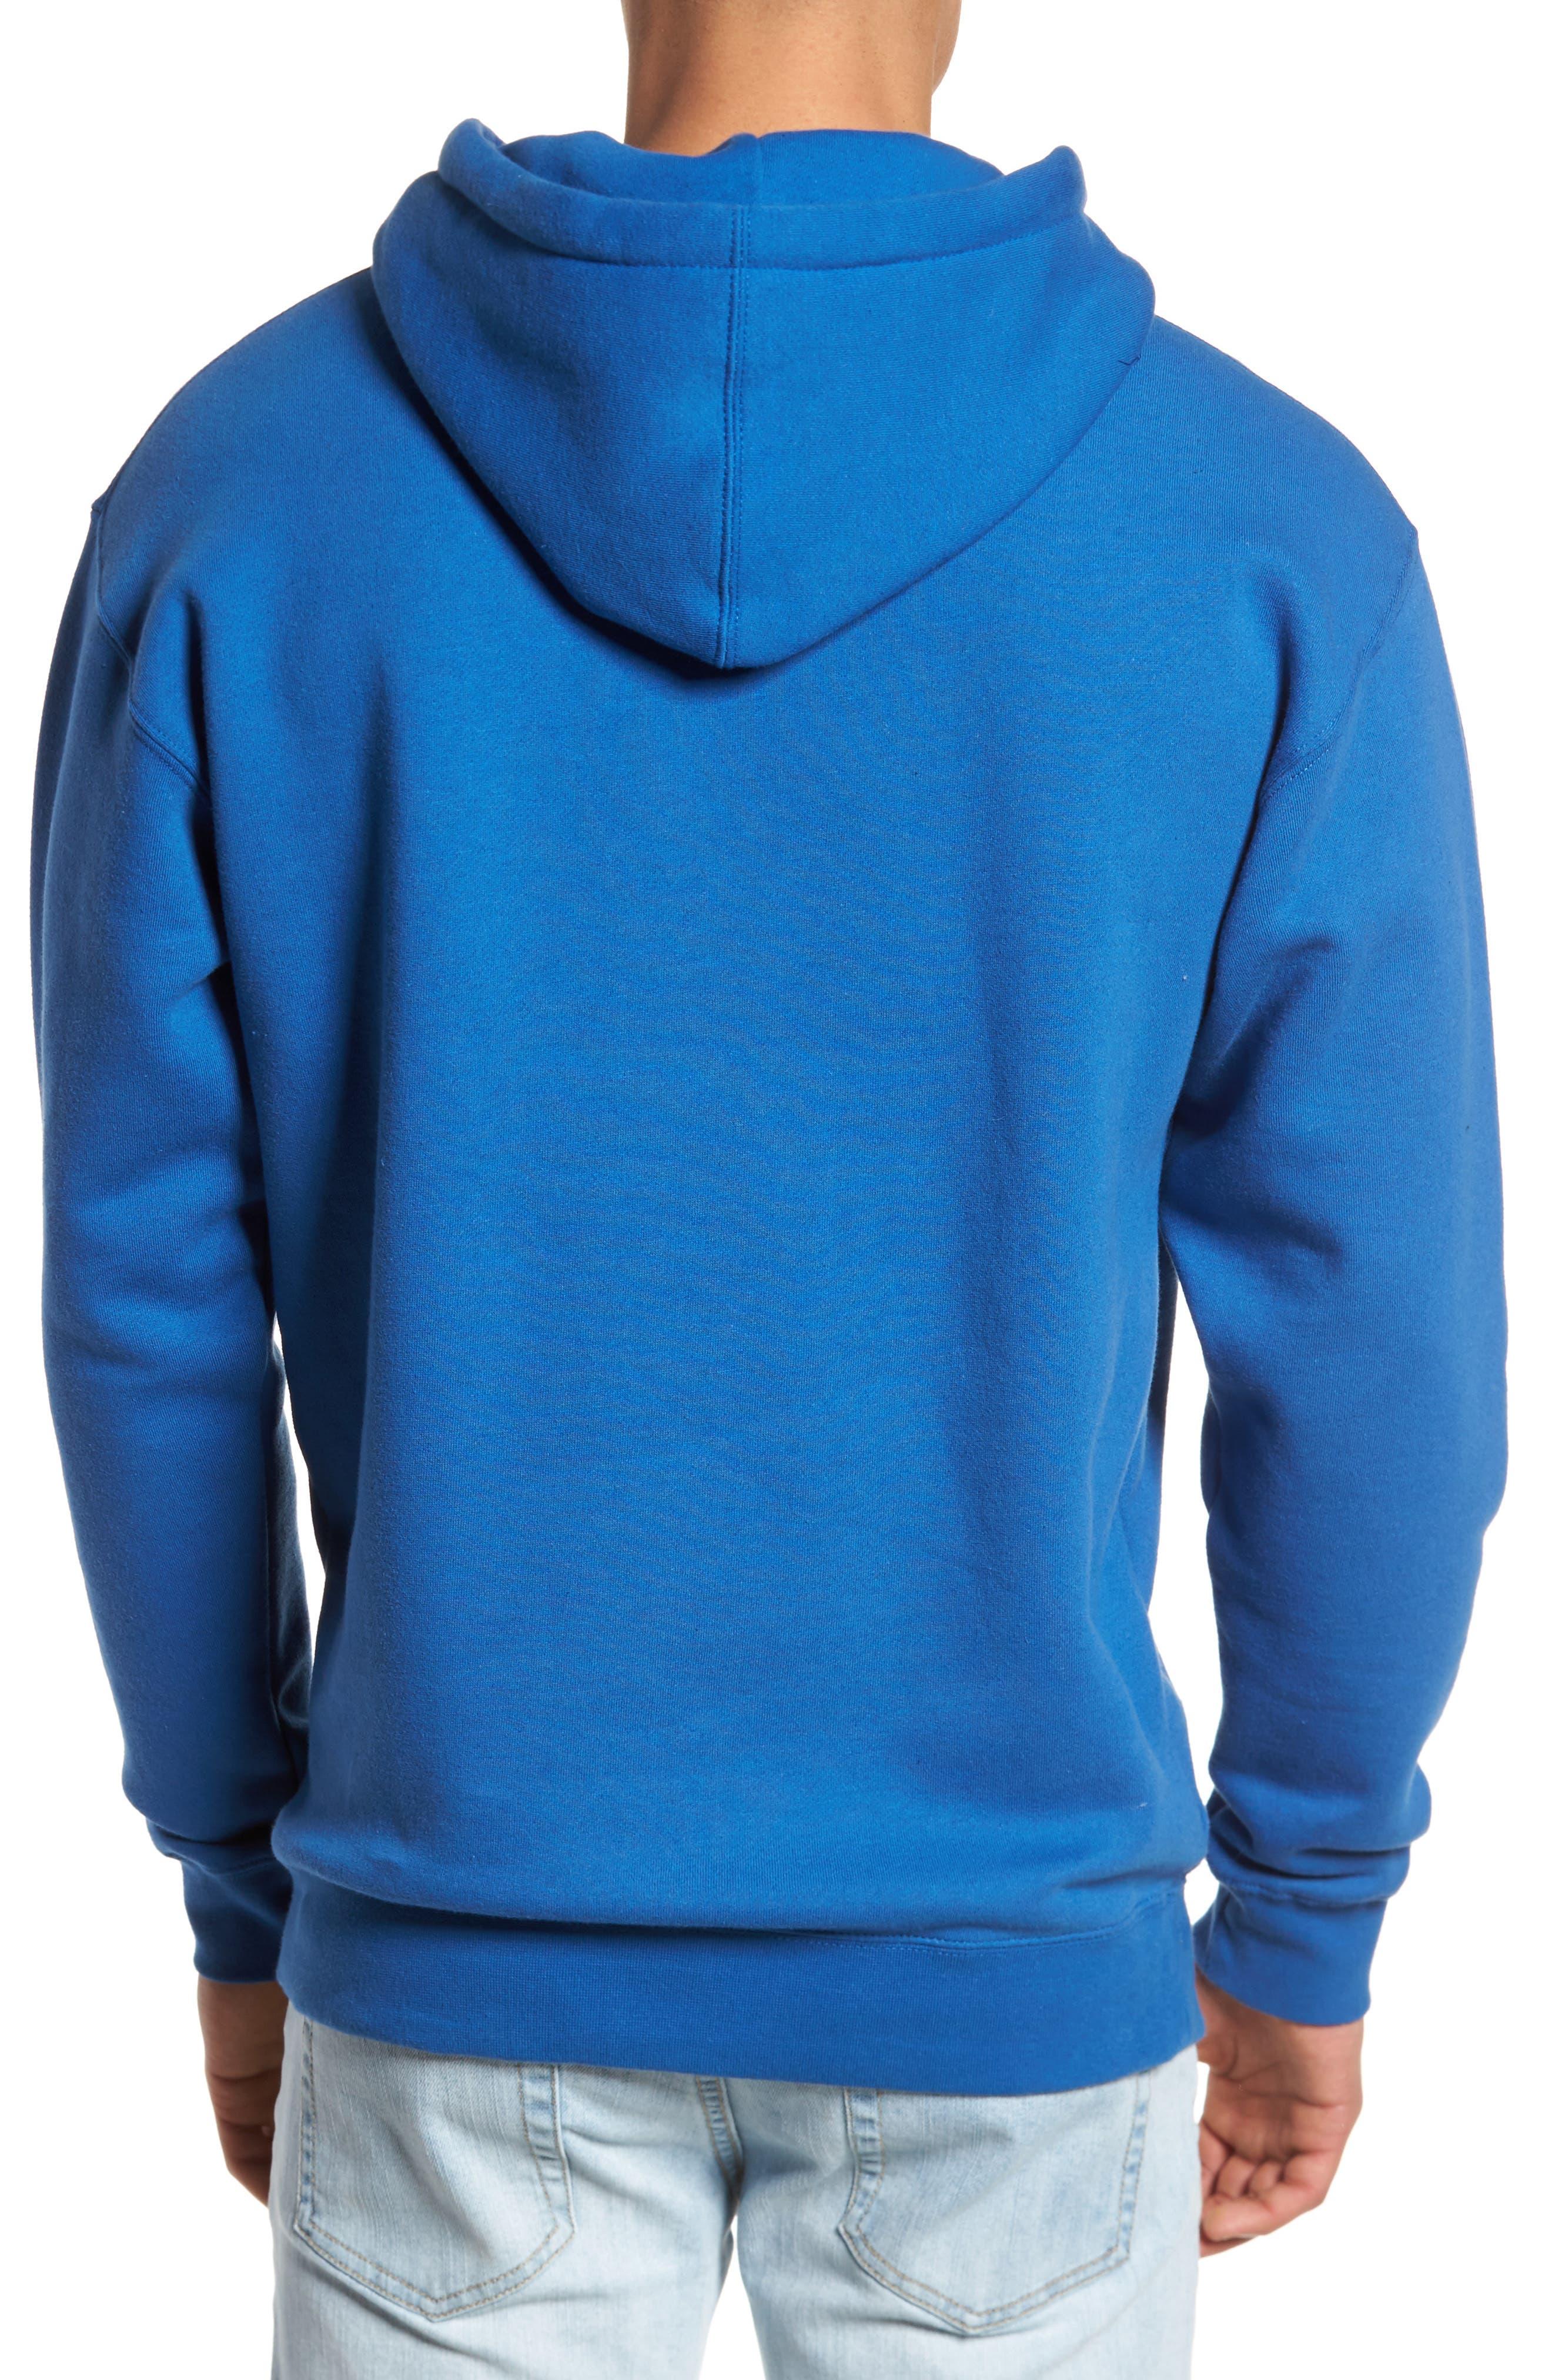 Alternate Reality Hoodie Sweatshirt,                             Alternate thumbnail 2, color,                             Royal Blue